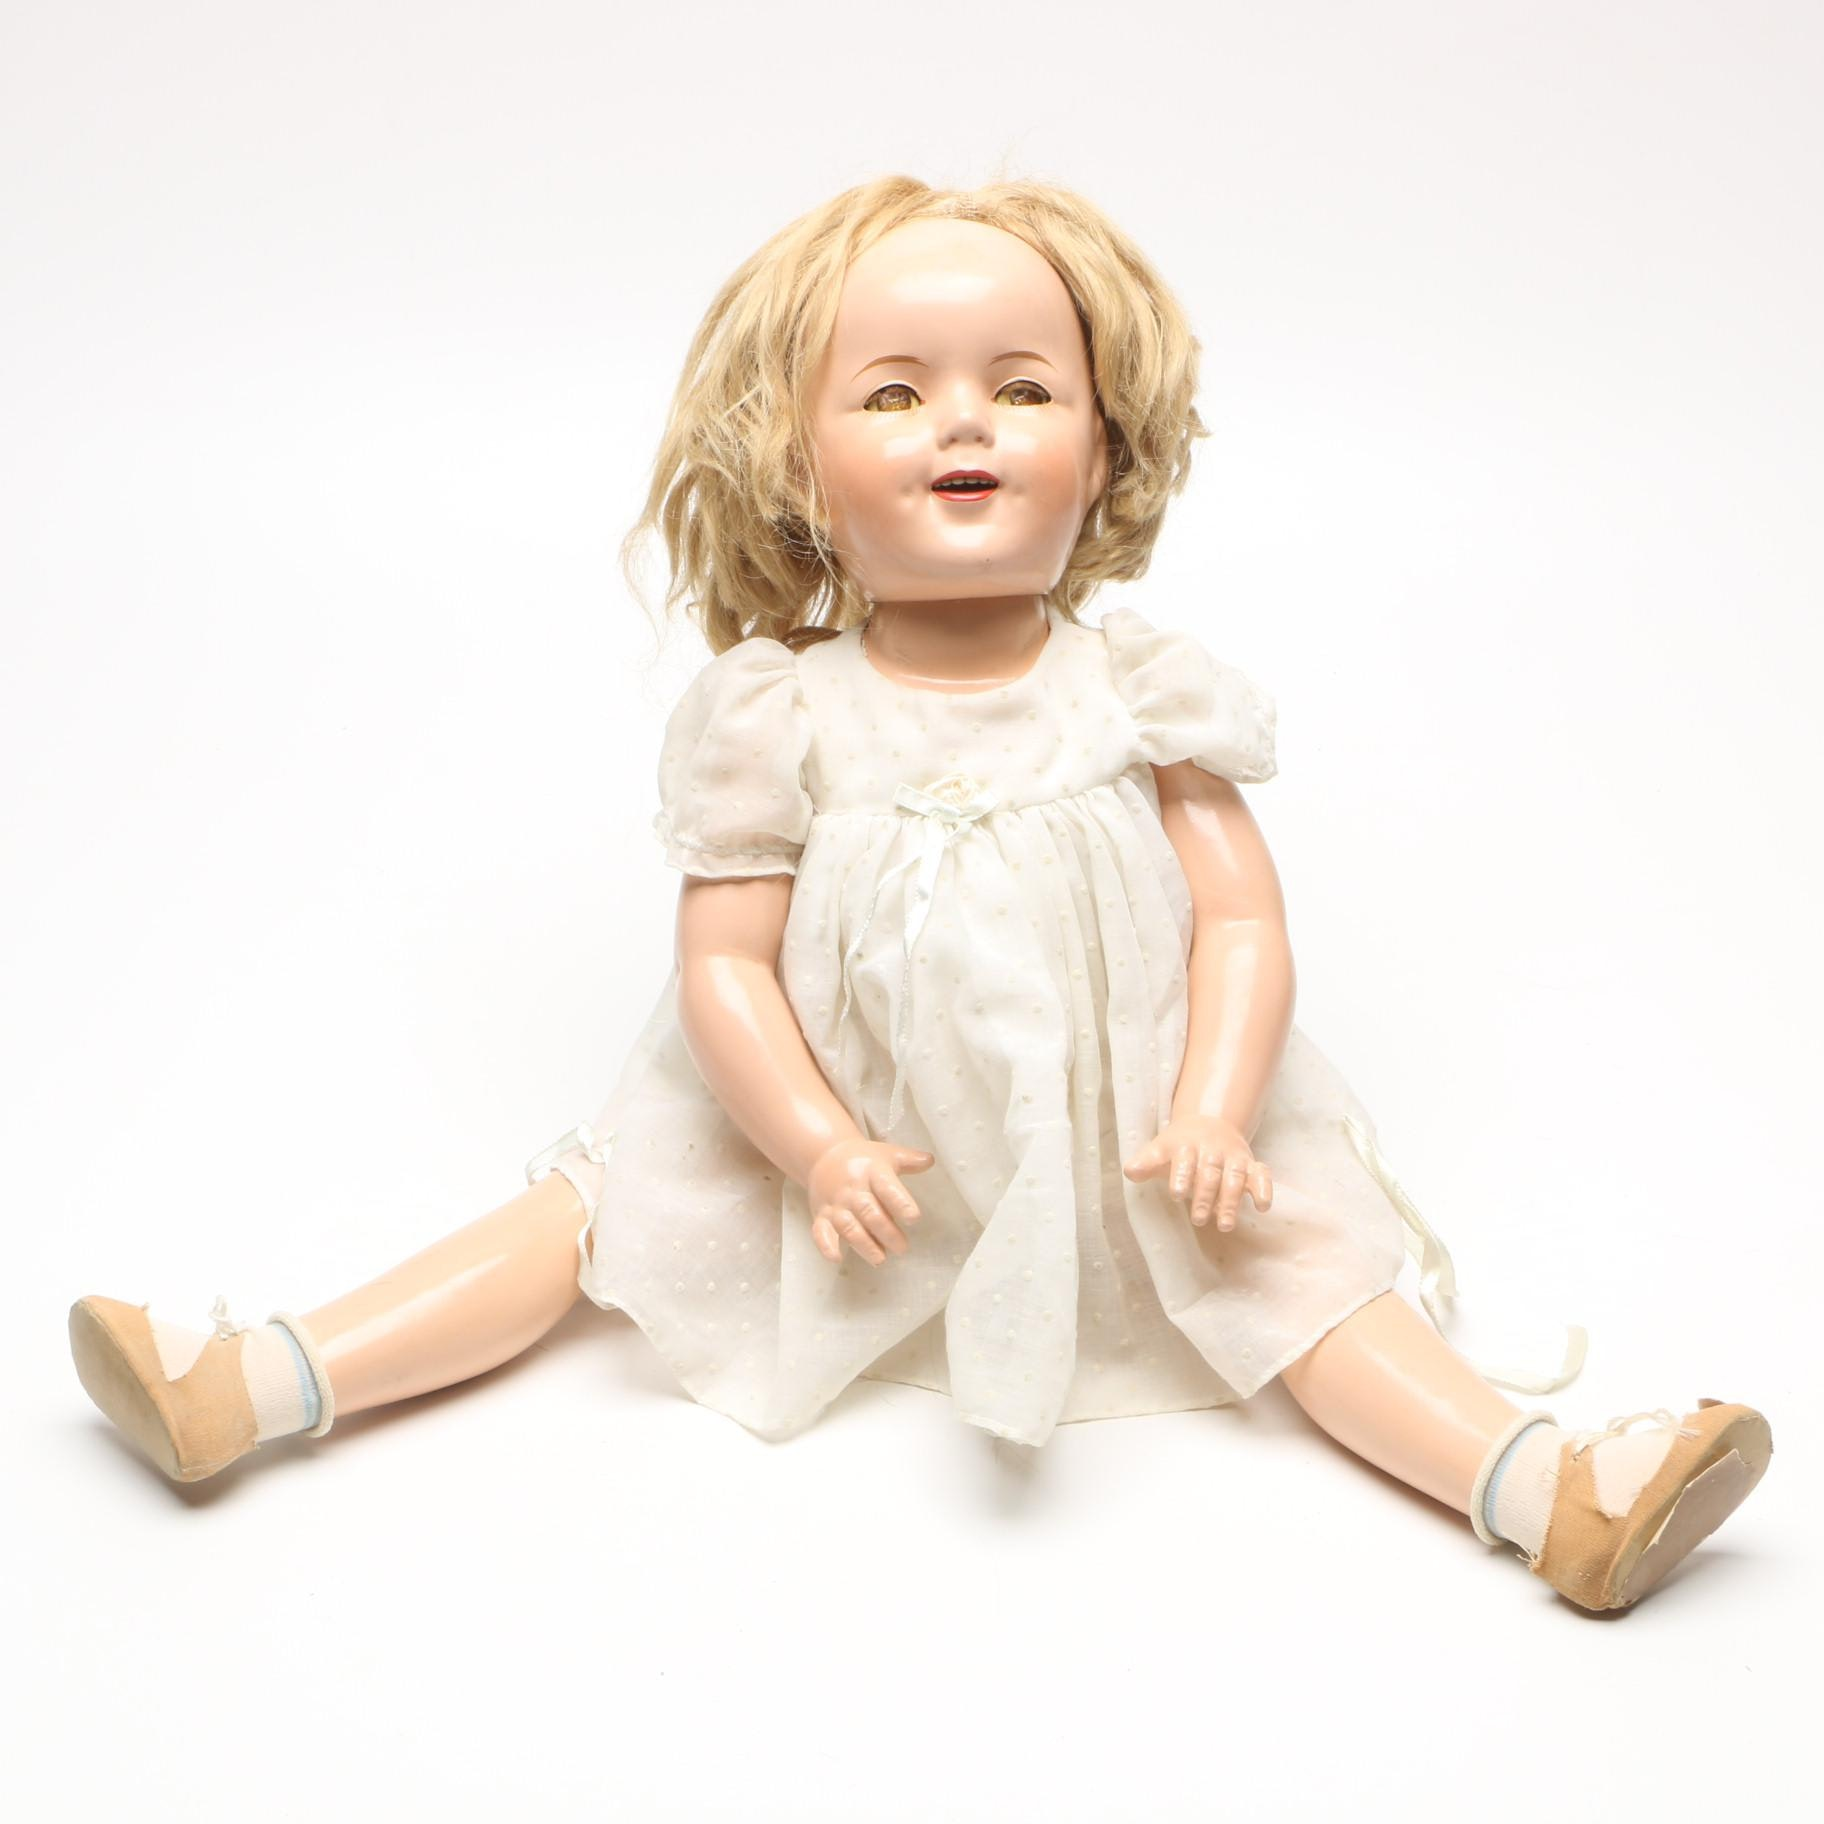 Original 1930s Shirley Temple doll